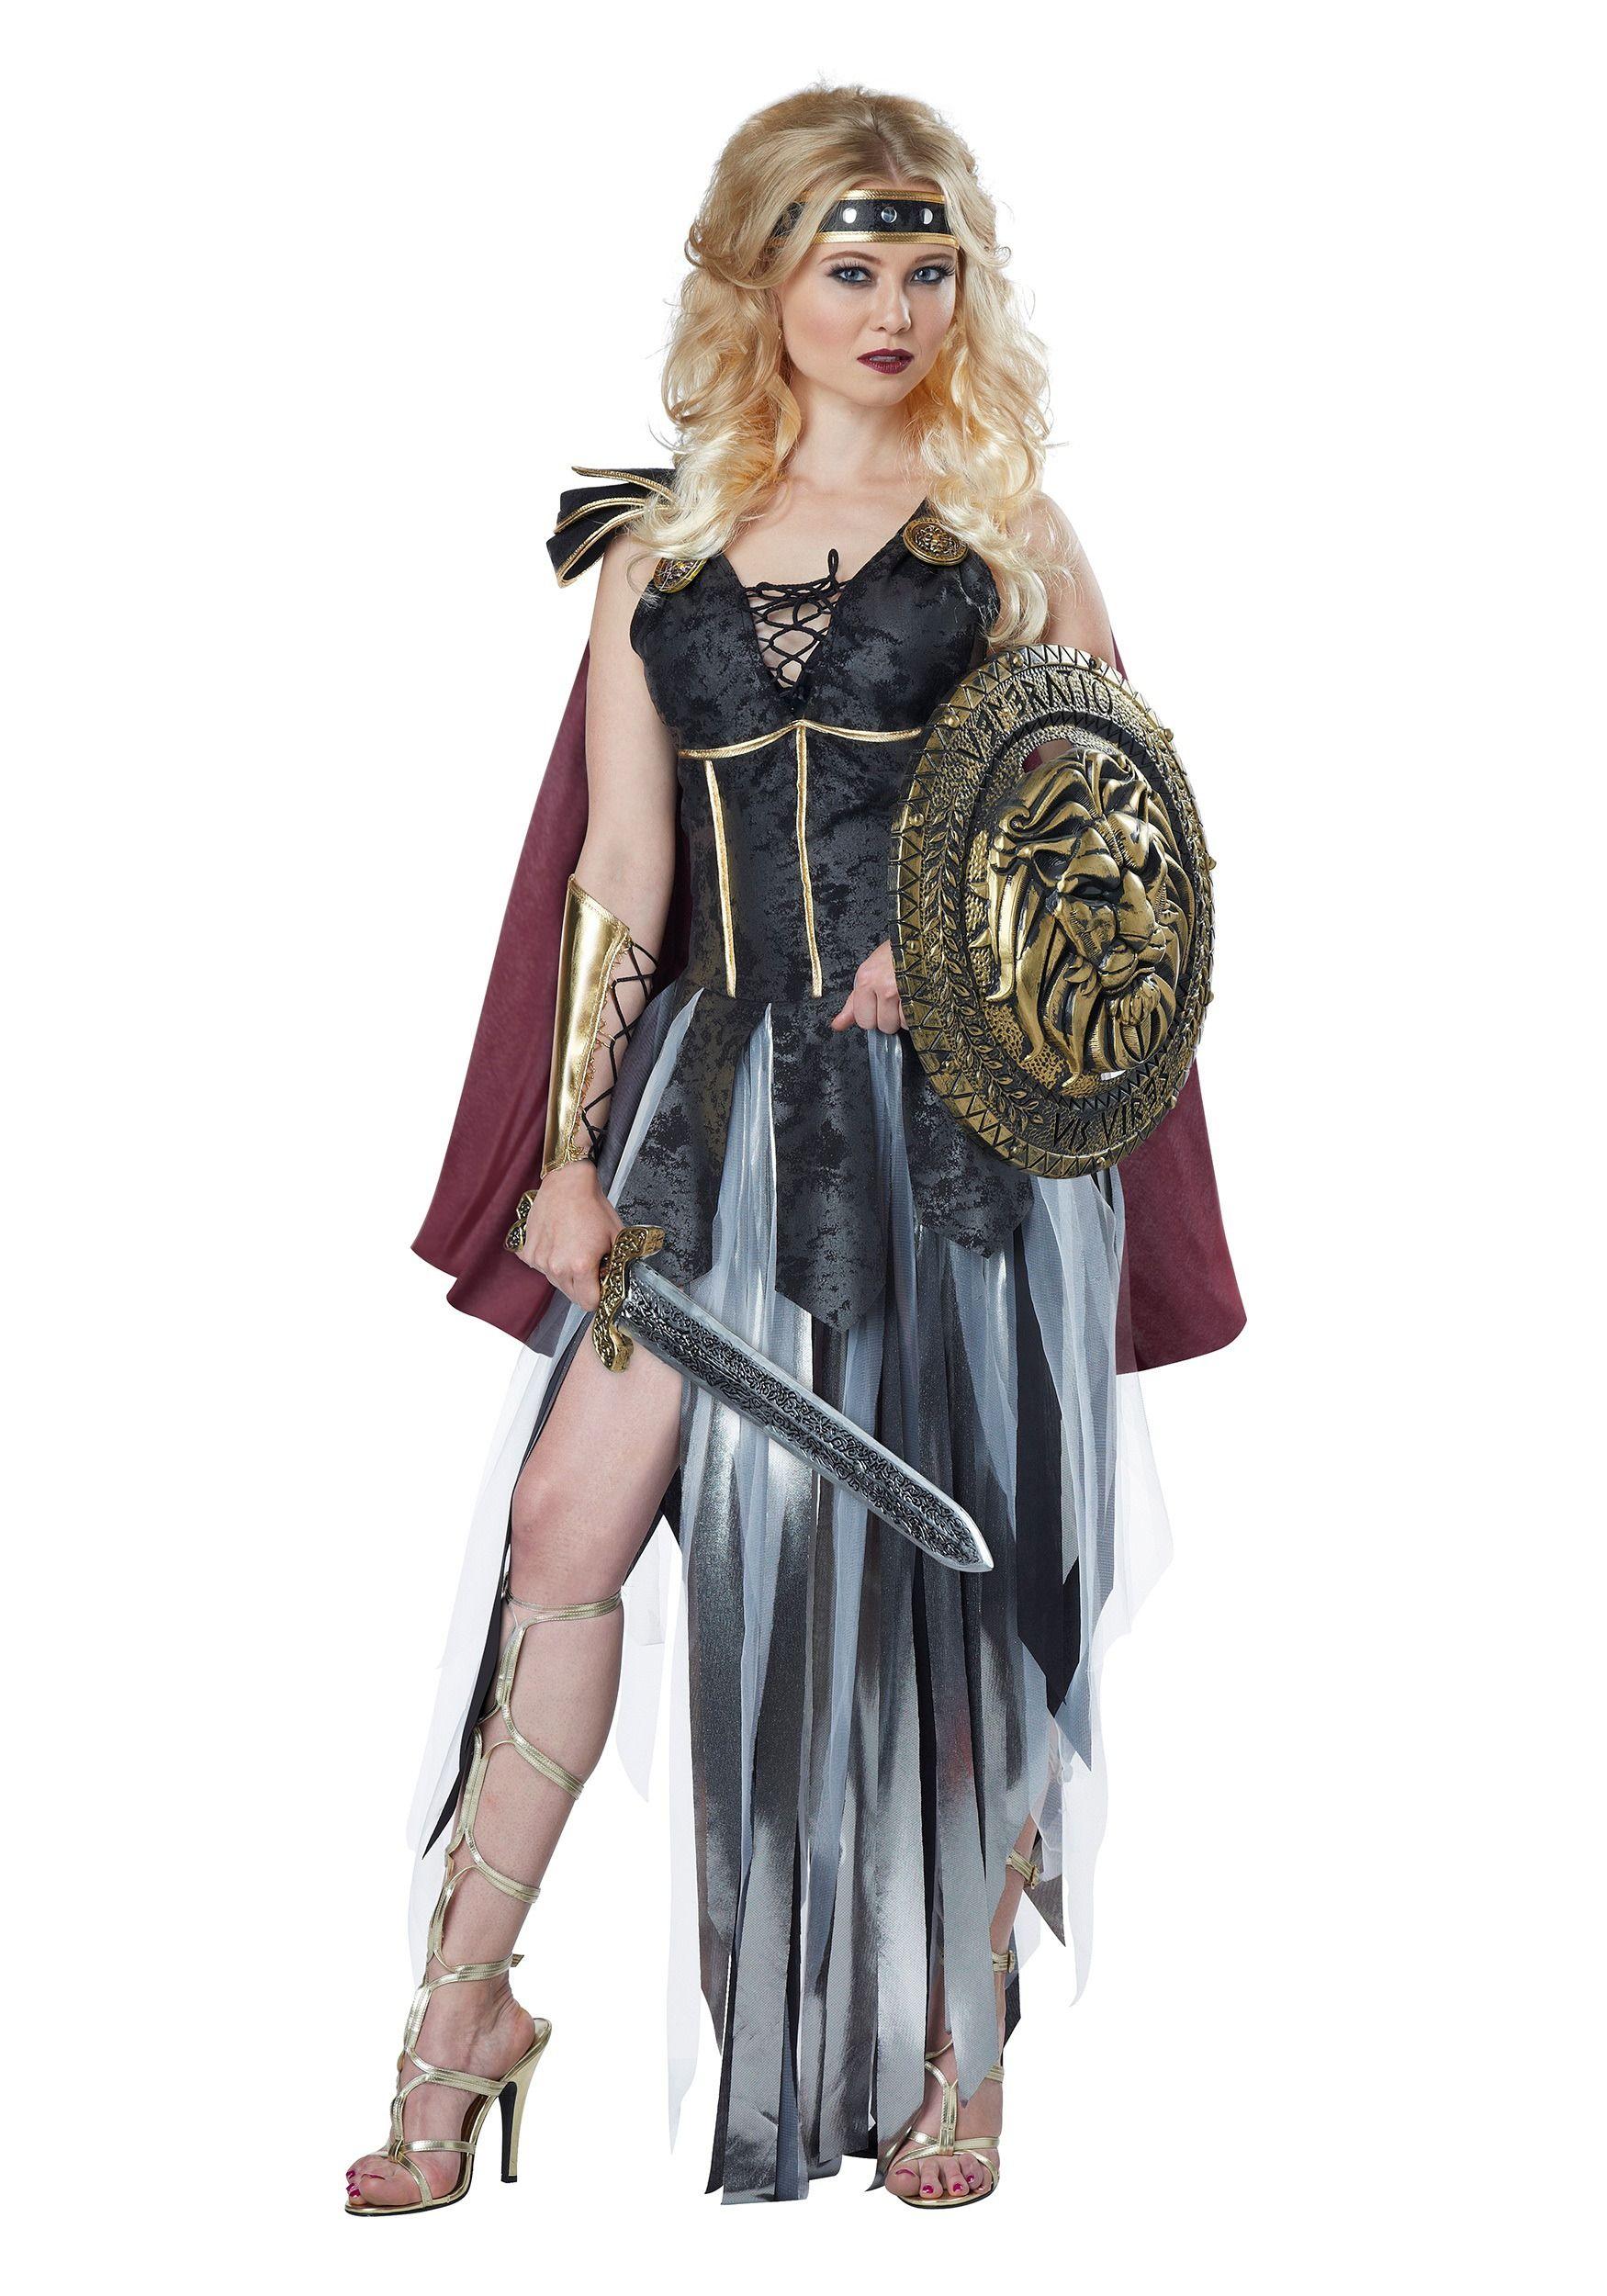 849eb99920 Women's Roman Gladiator Costume | Halloween | Gladiator costumes ...